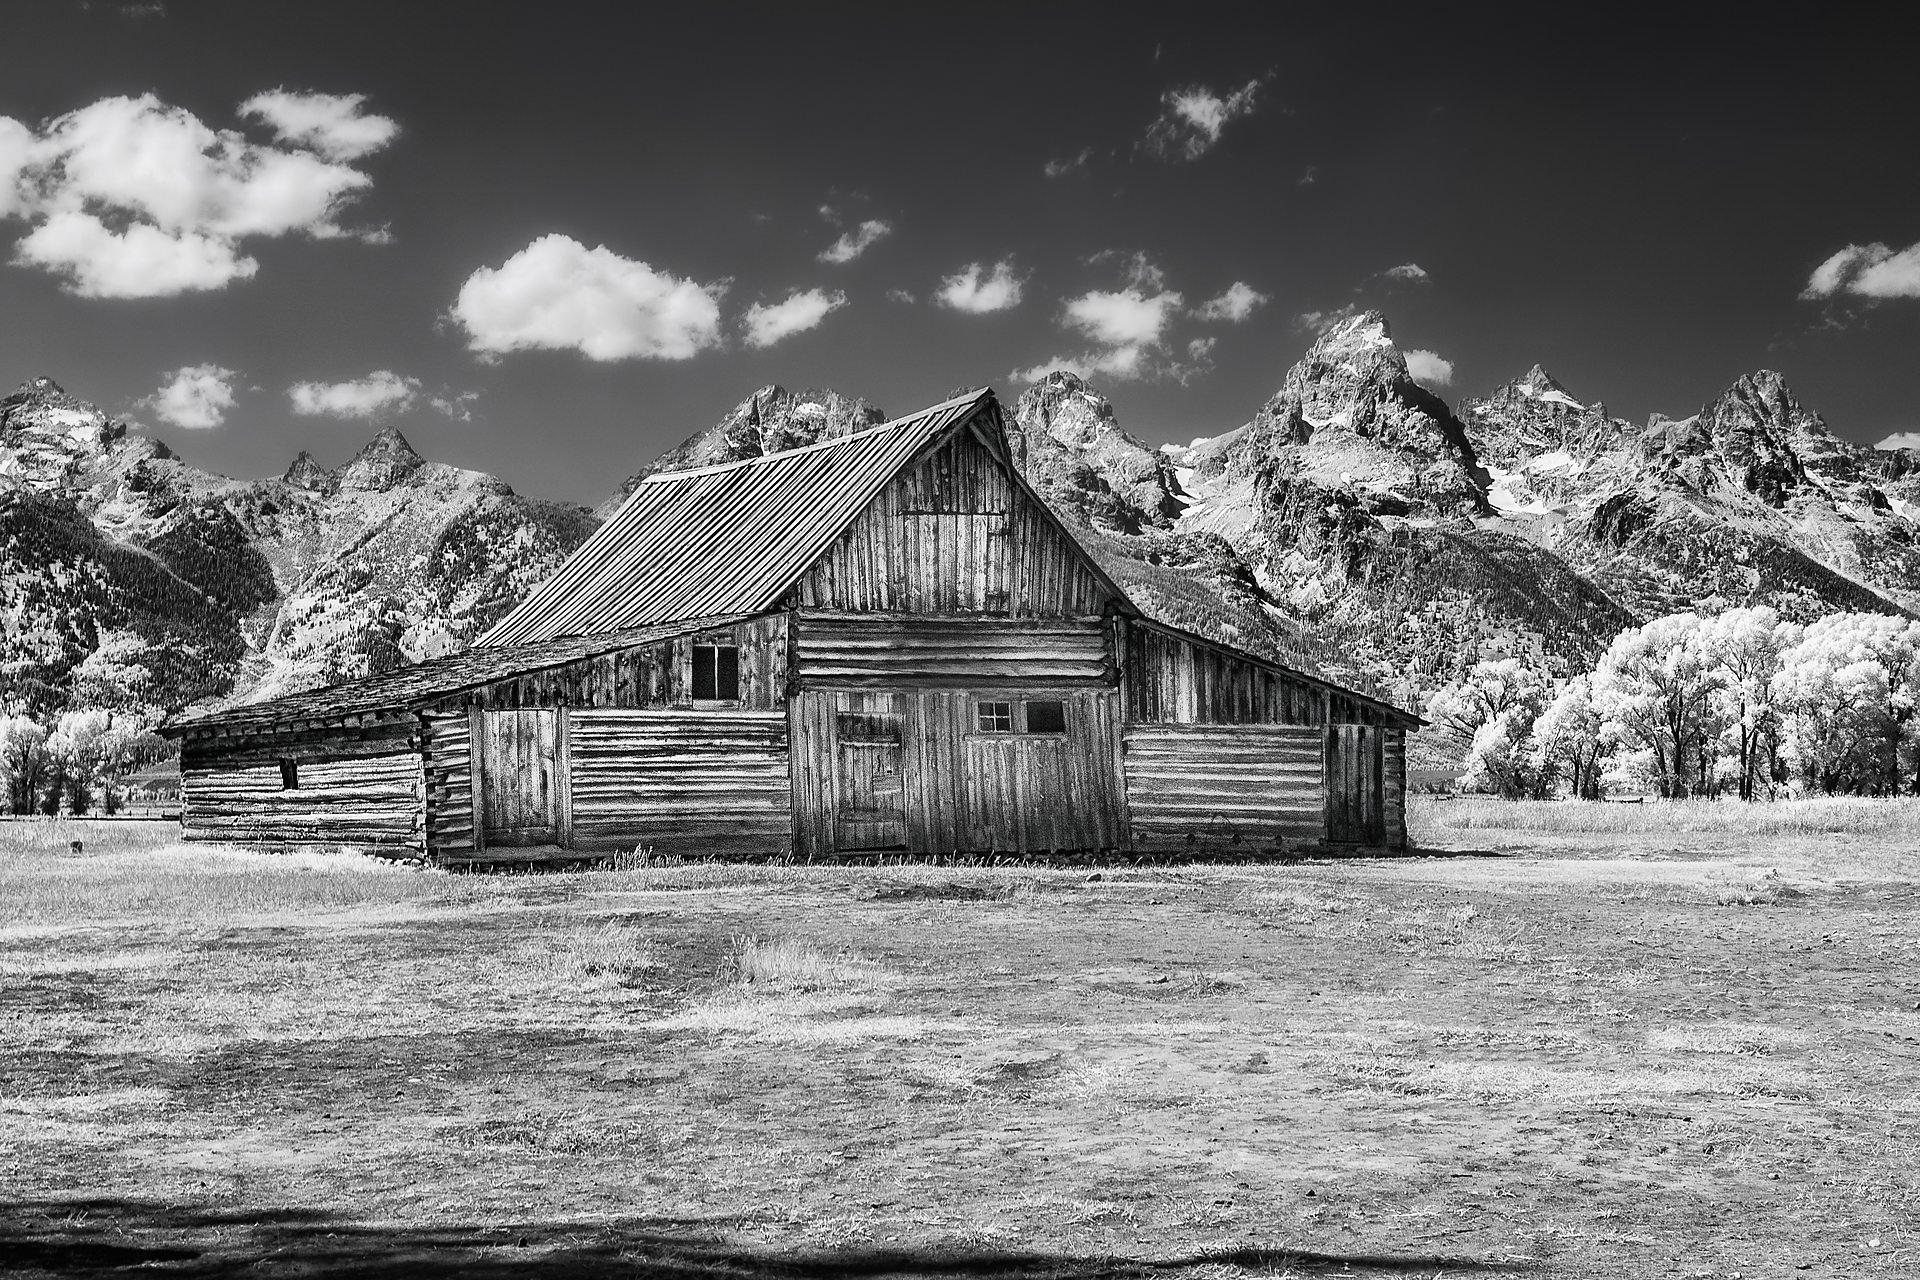 Moulton Barn, Morman Row, Grand Teton Park, Wyoming